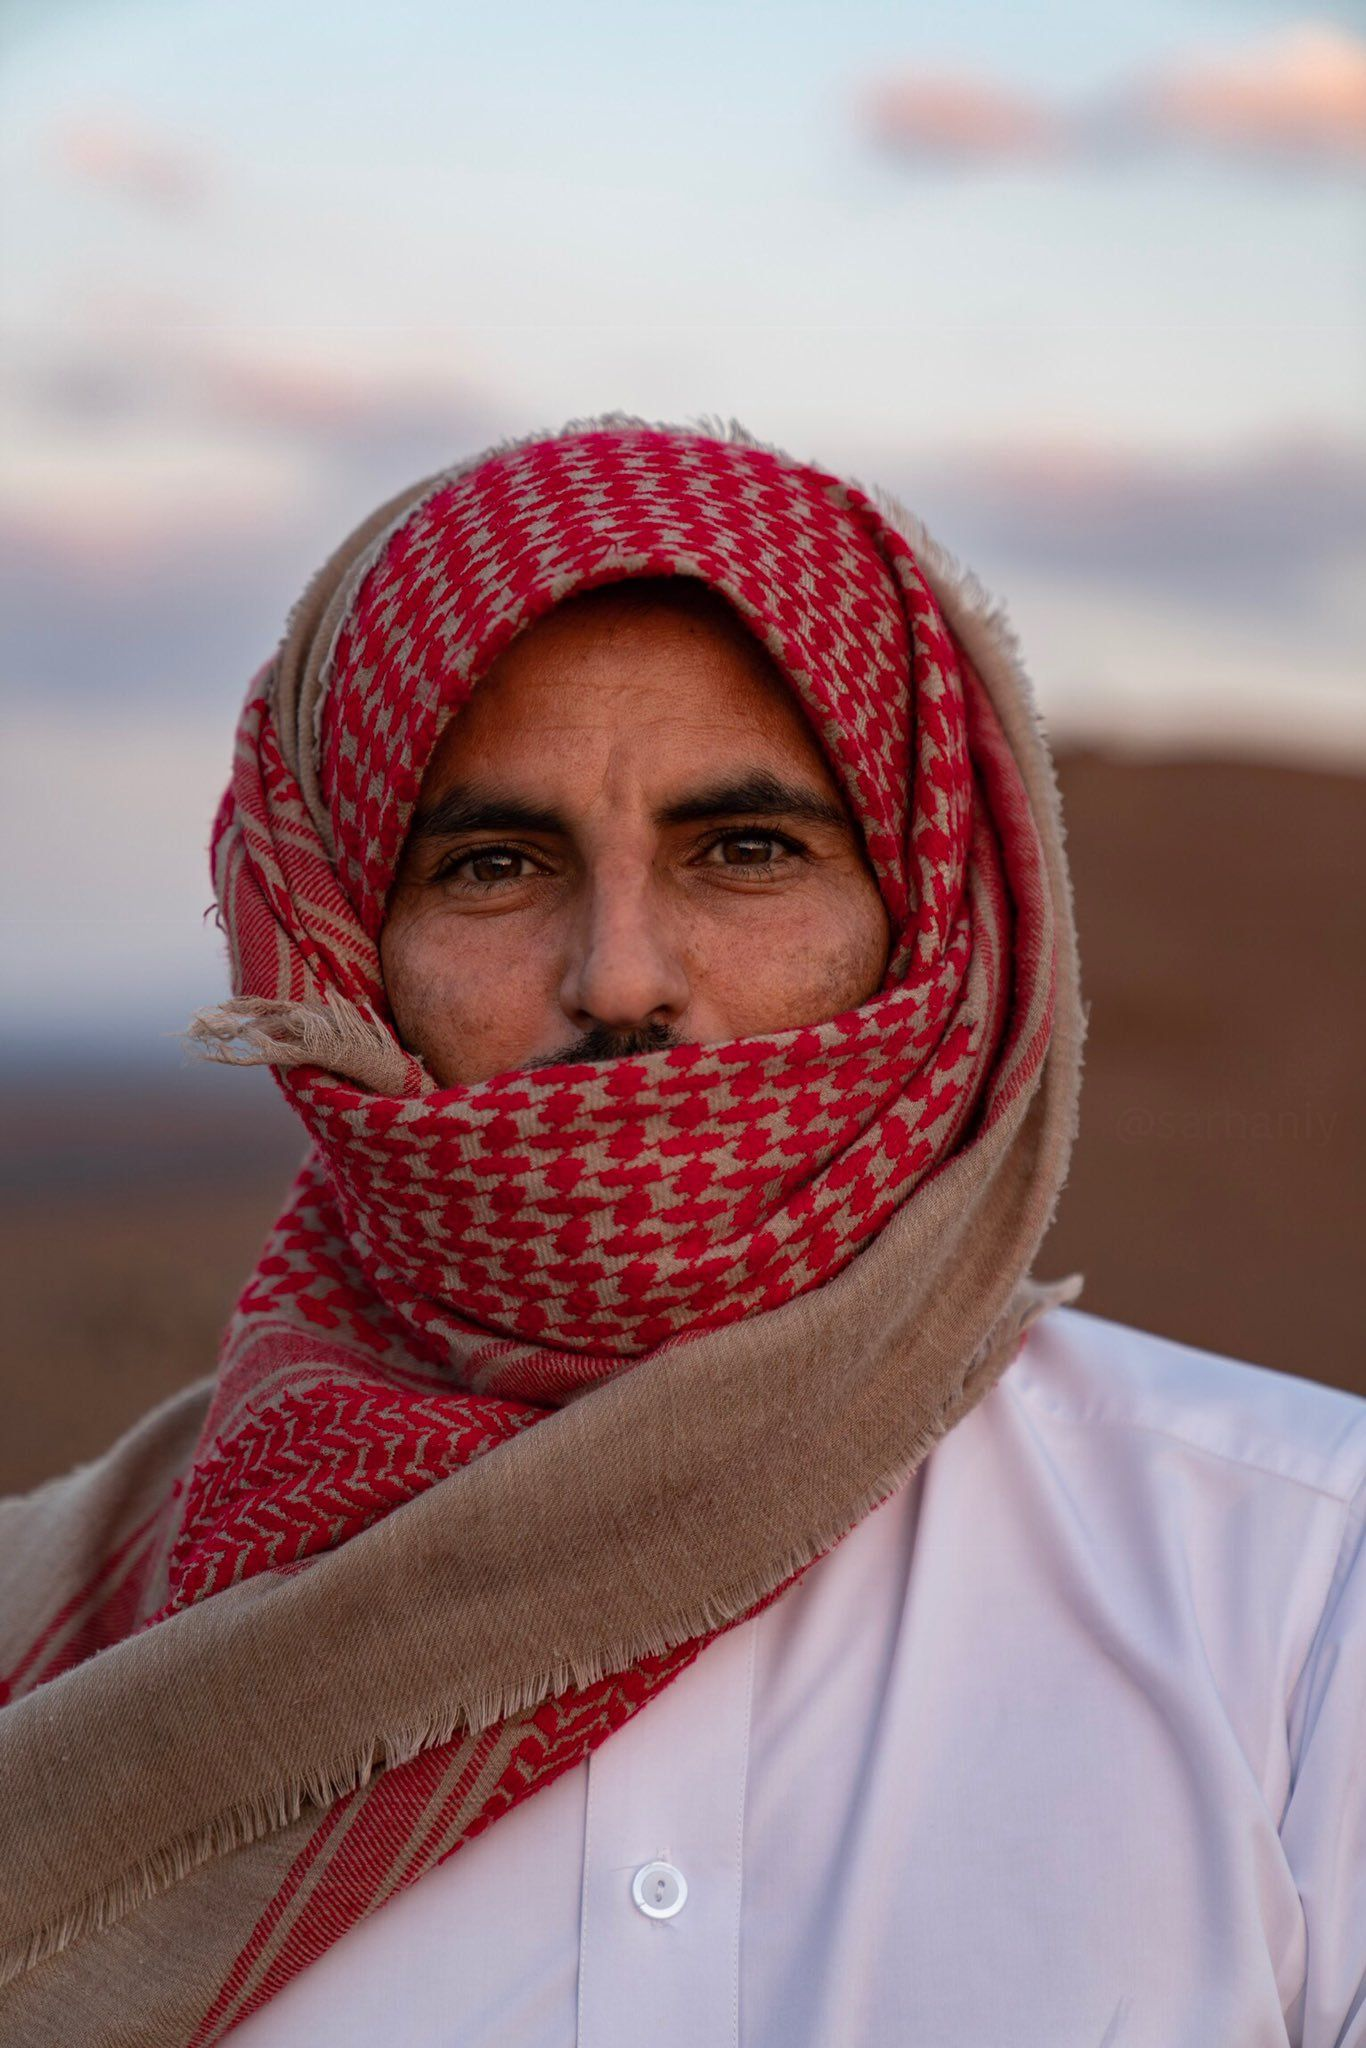 Pin on ساهر الليل - Gulf people things